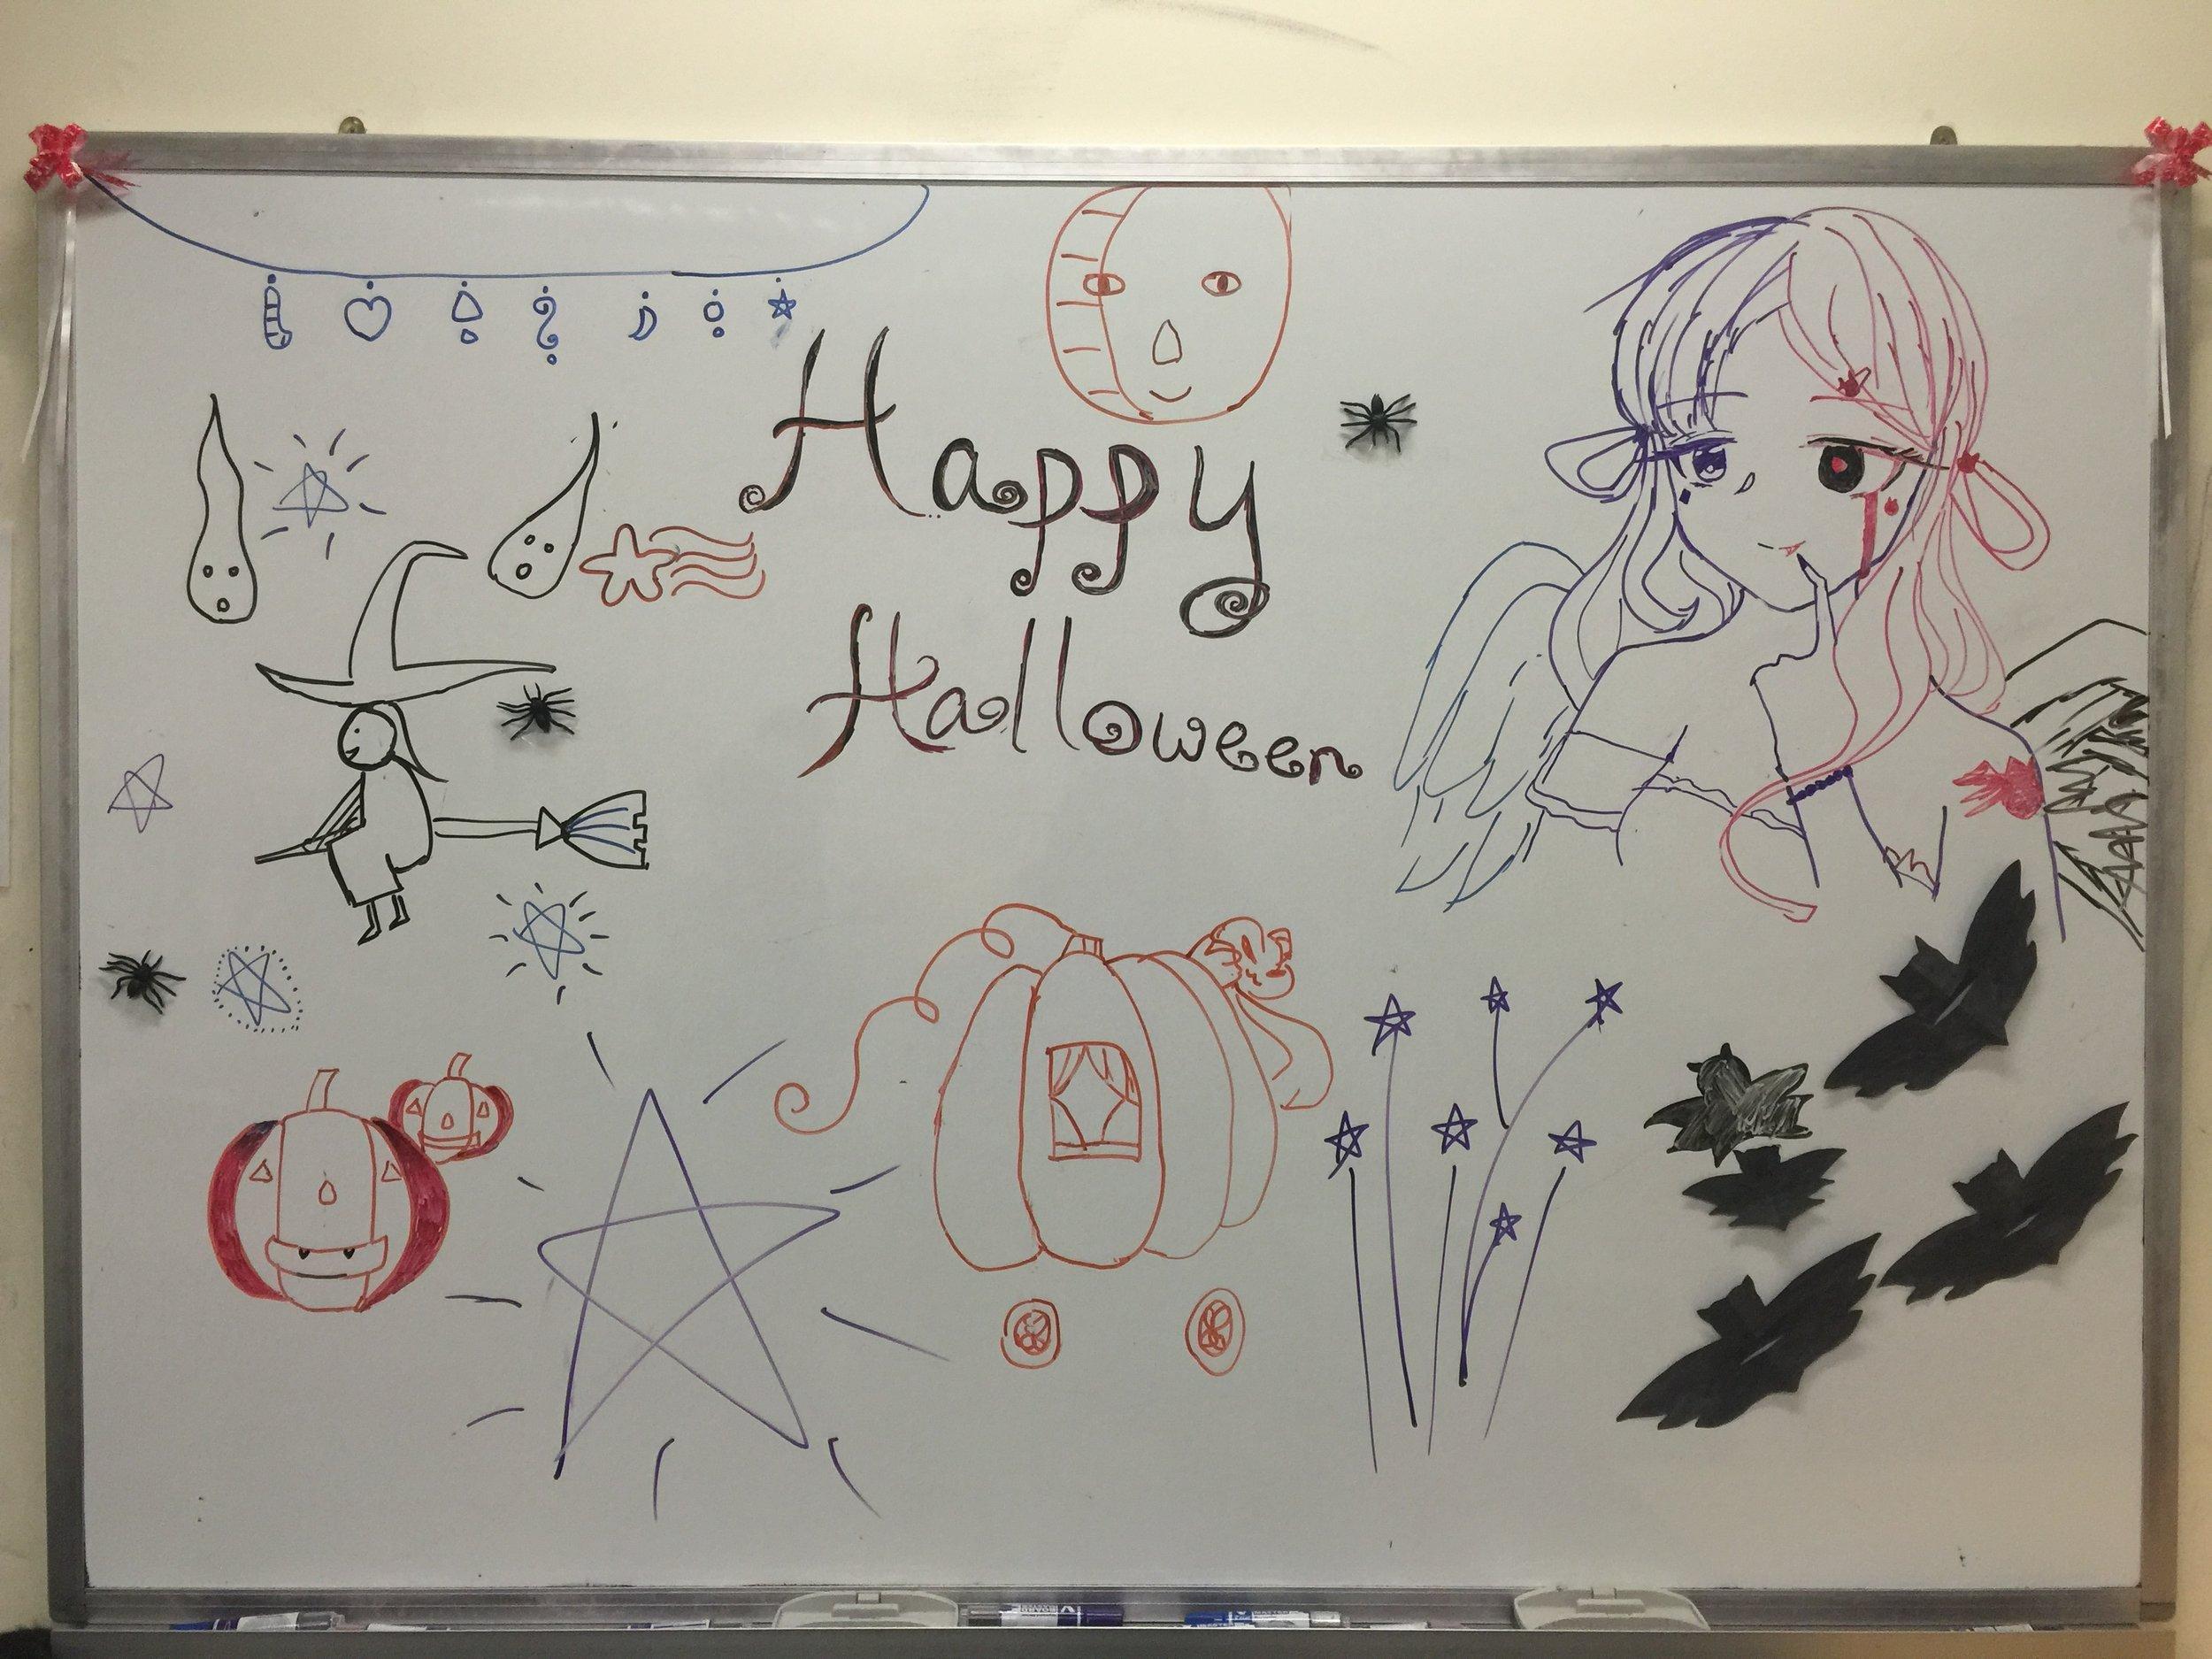 Happy Halloween_P5 Math class (2).JPG